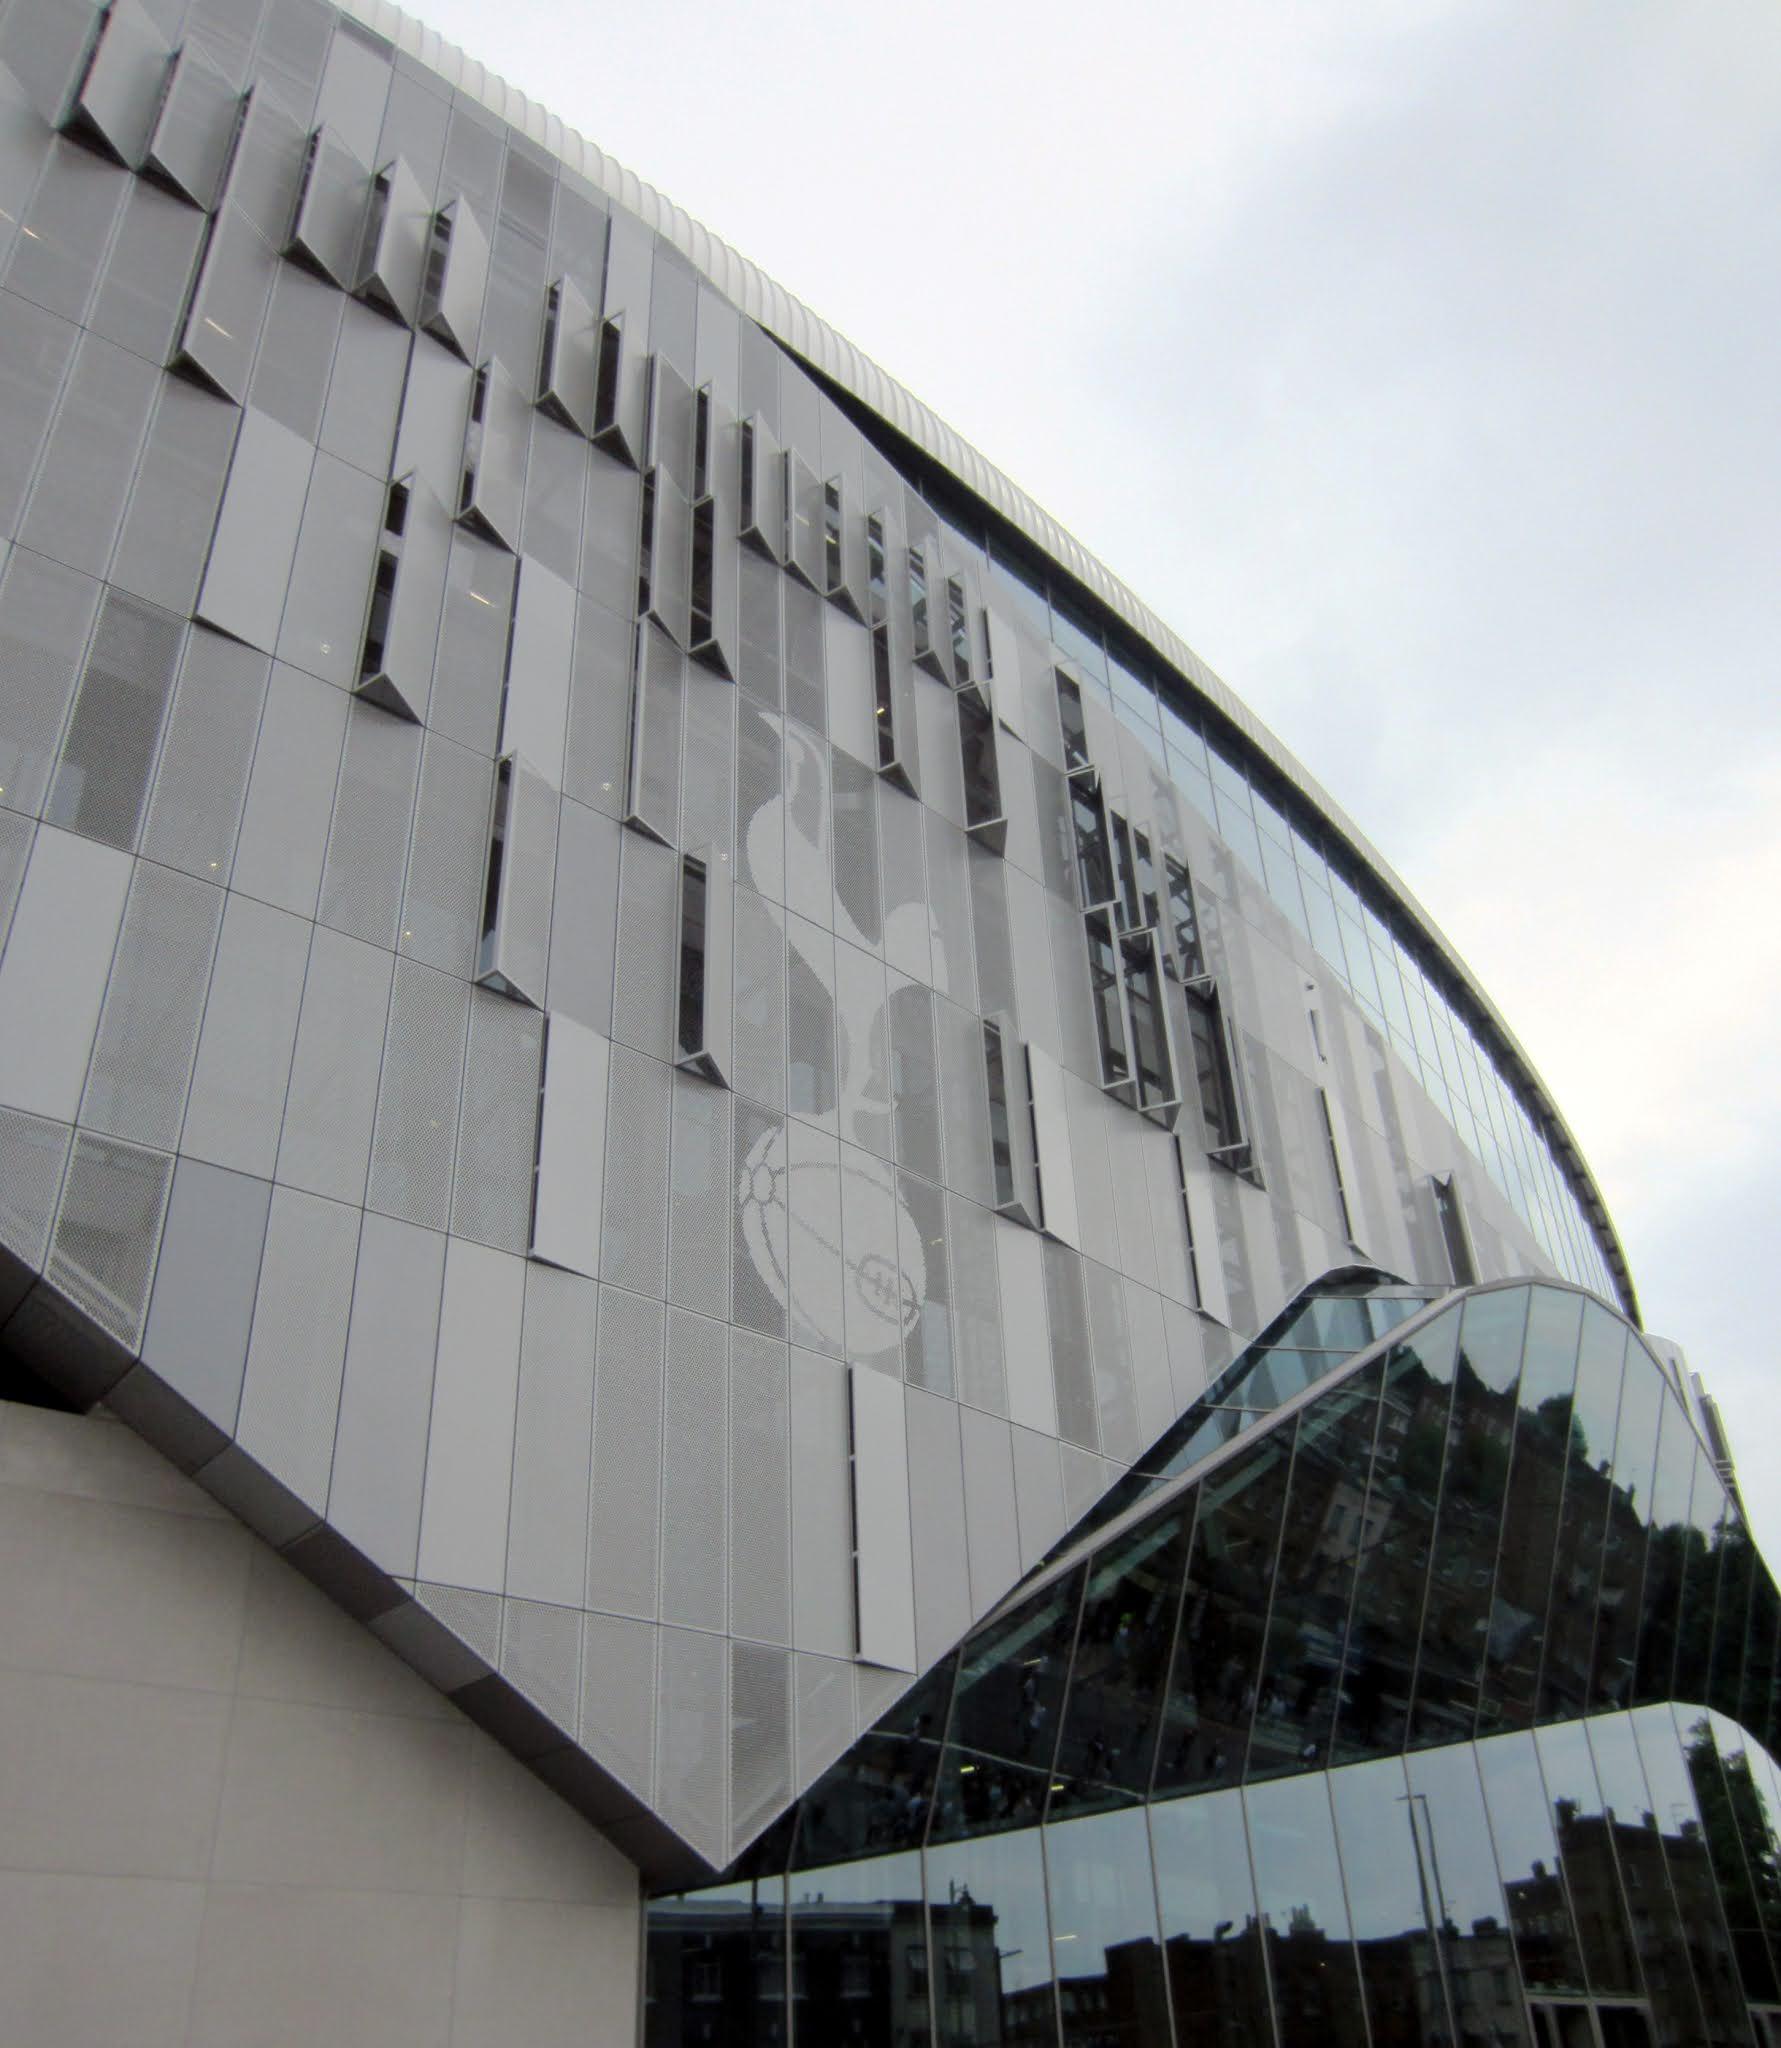 Tottenham Hotspur logo on the exterior façade of Tottenham Hotspur Stadium